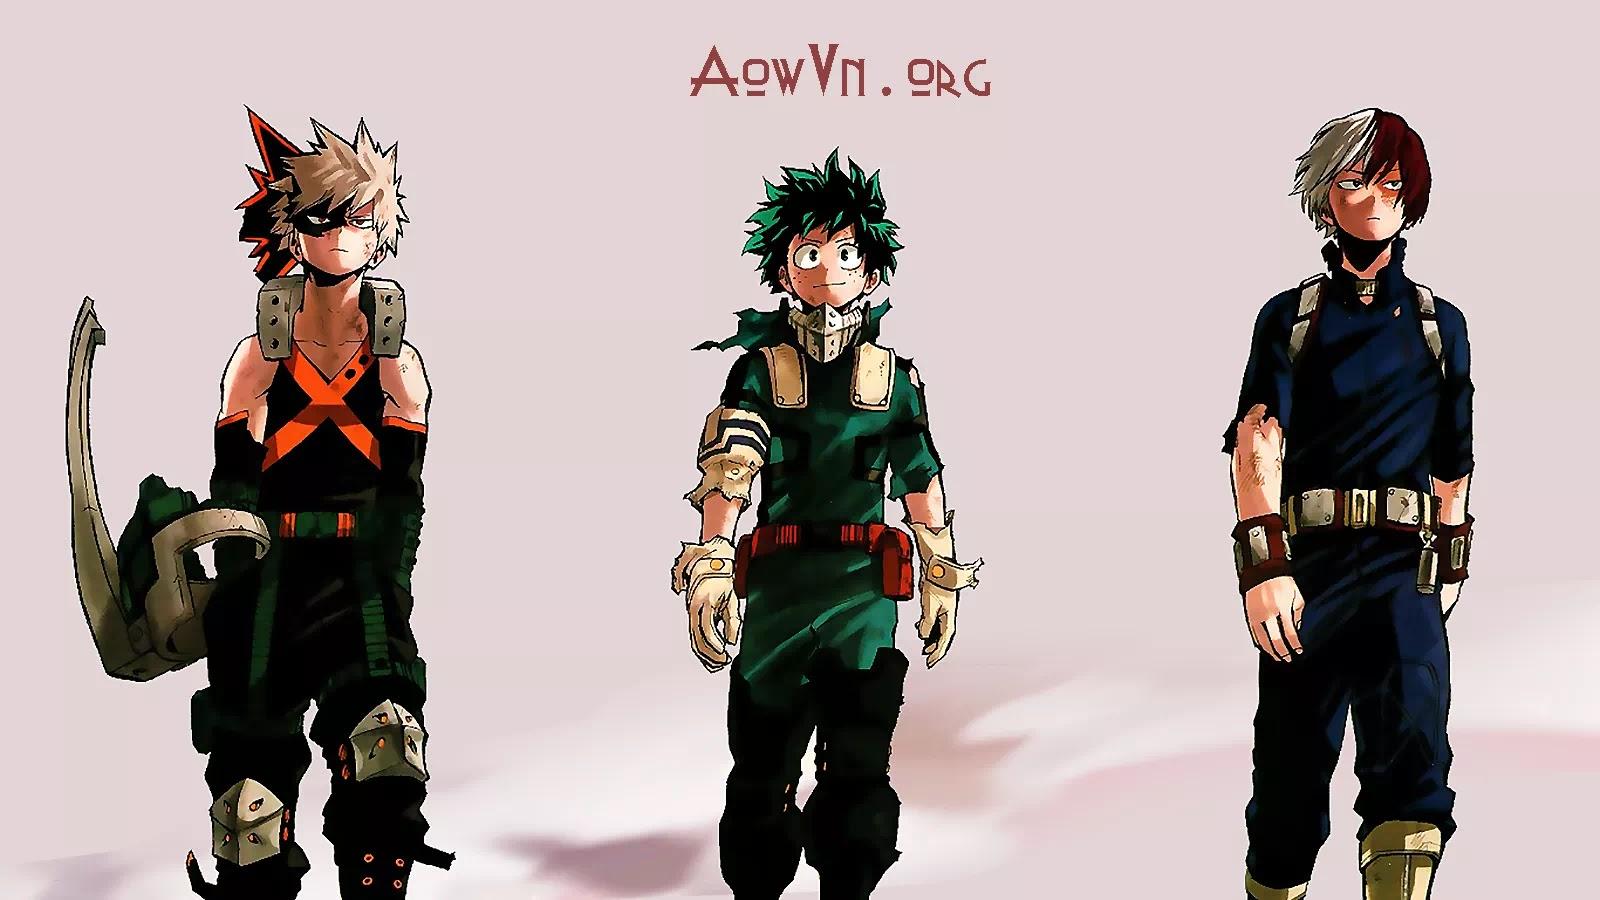 AowVN.org minz%2B%25284%2529 - [ Anime 3gp Mp4 ] Boku No Hero Academia SS1 + SS2 + OVA | Vietsub - Tuyệt Hay